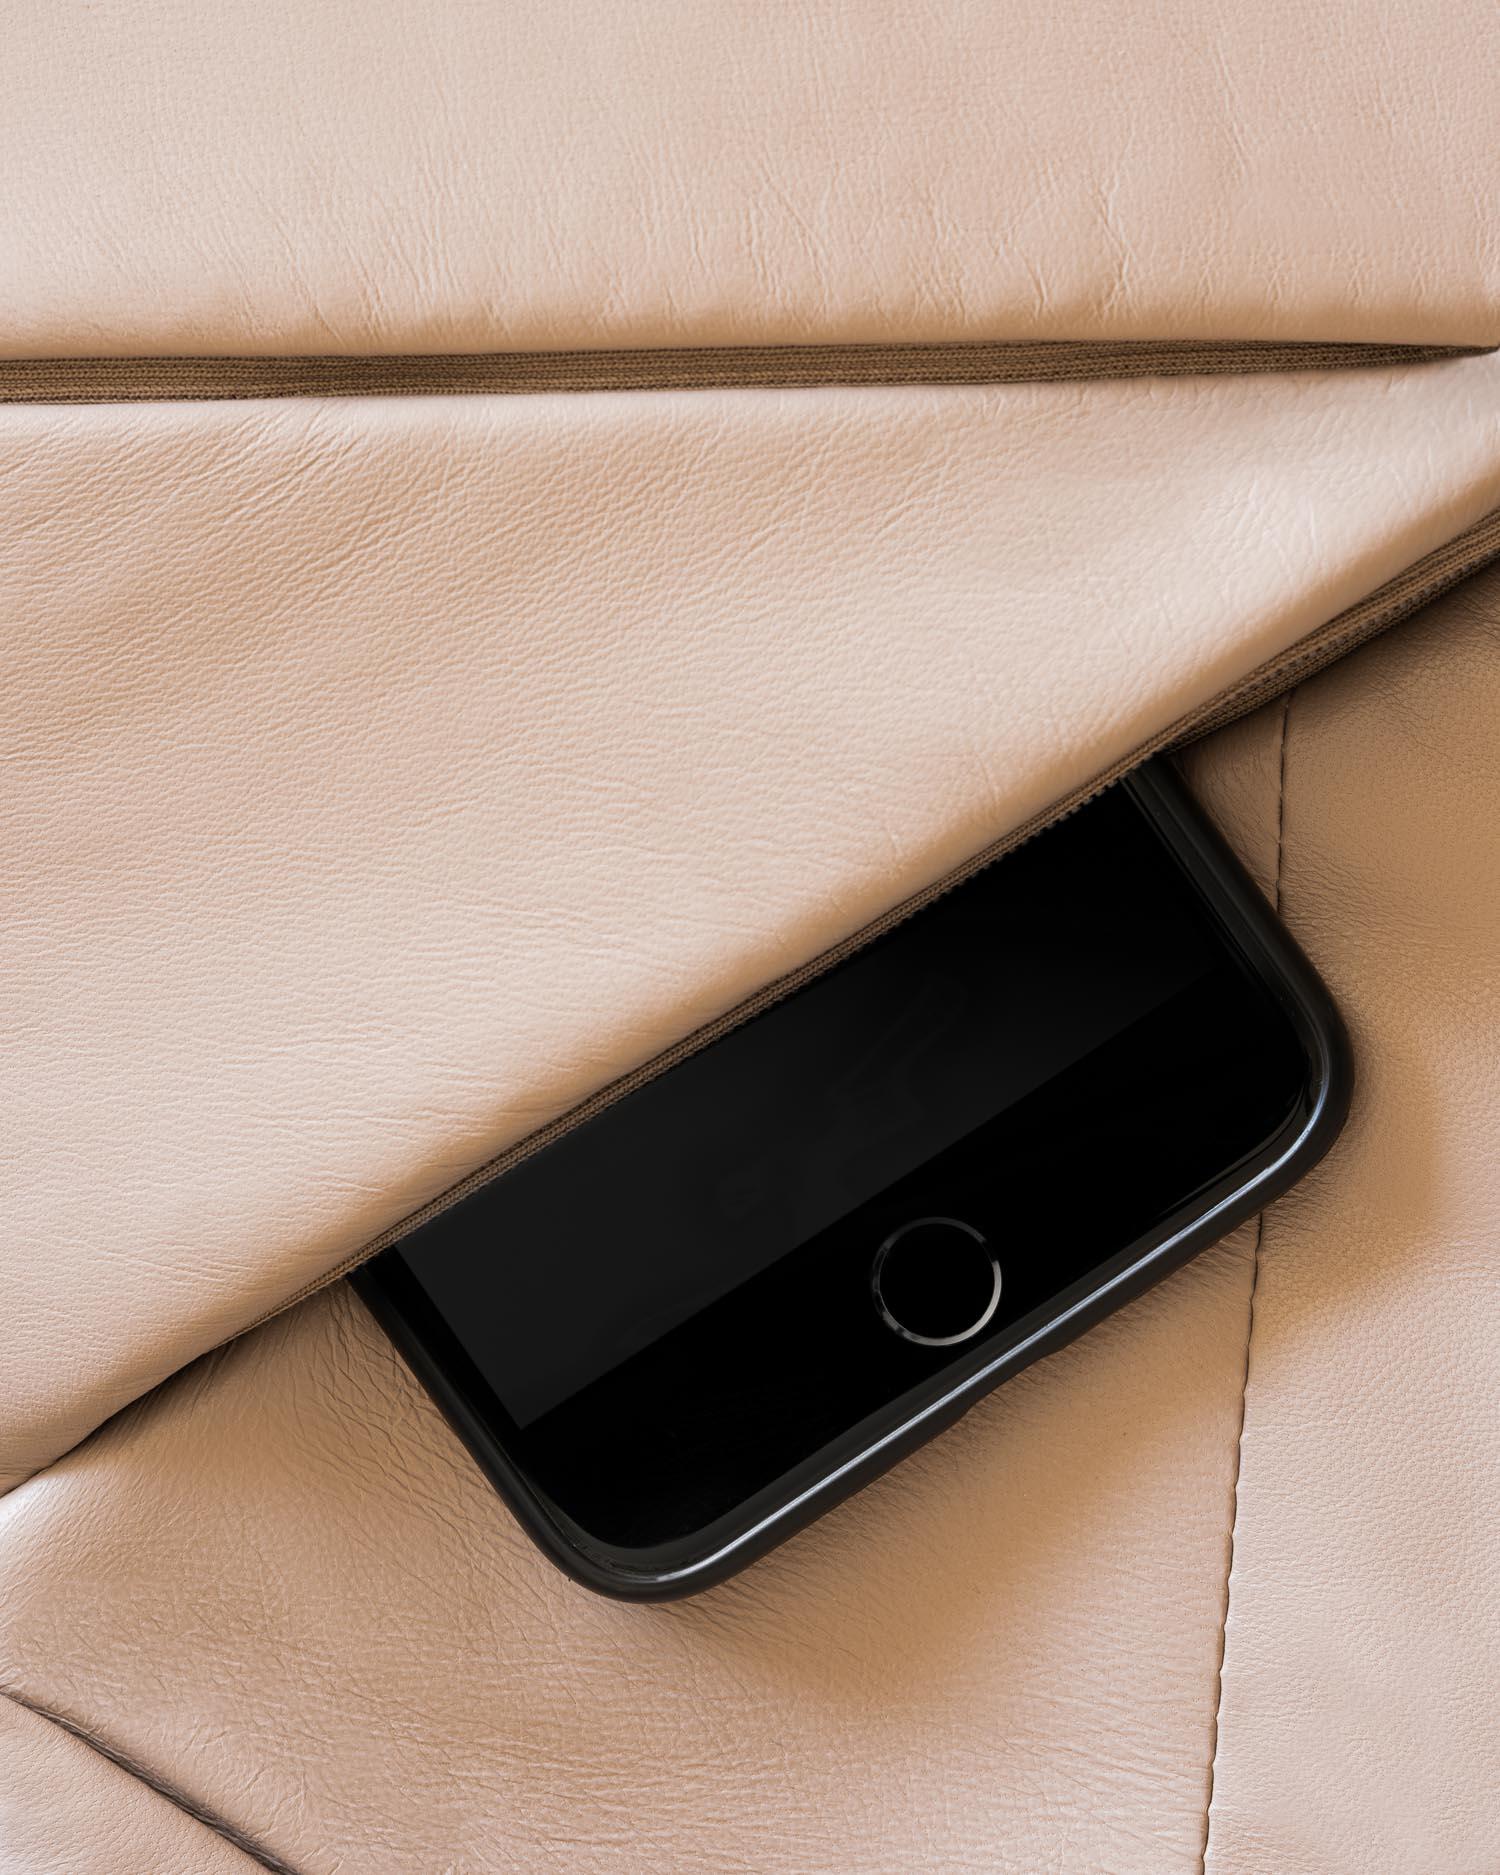 Italian Nappa leather crossbody bag closeup with iPhone